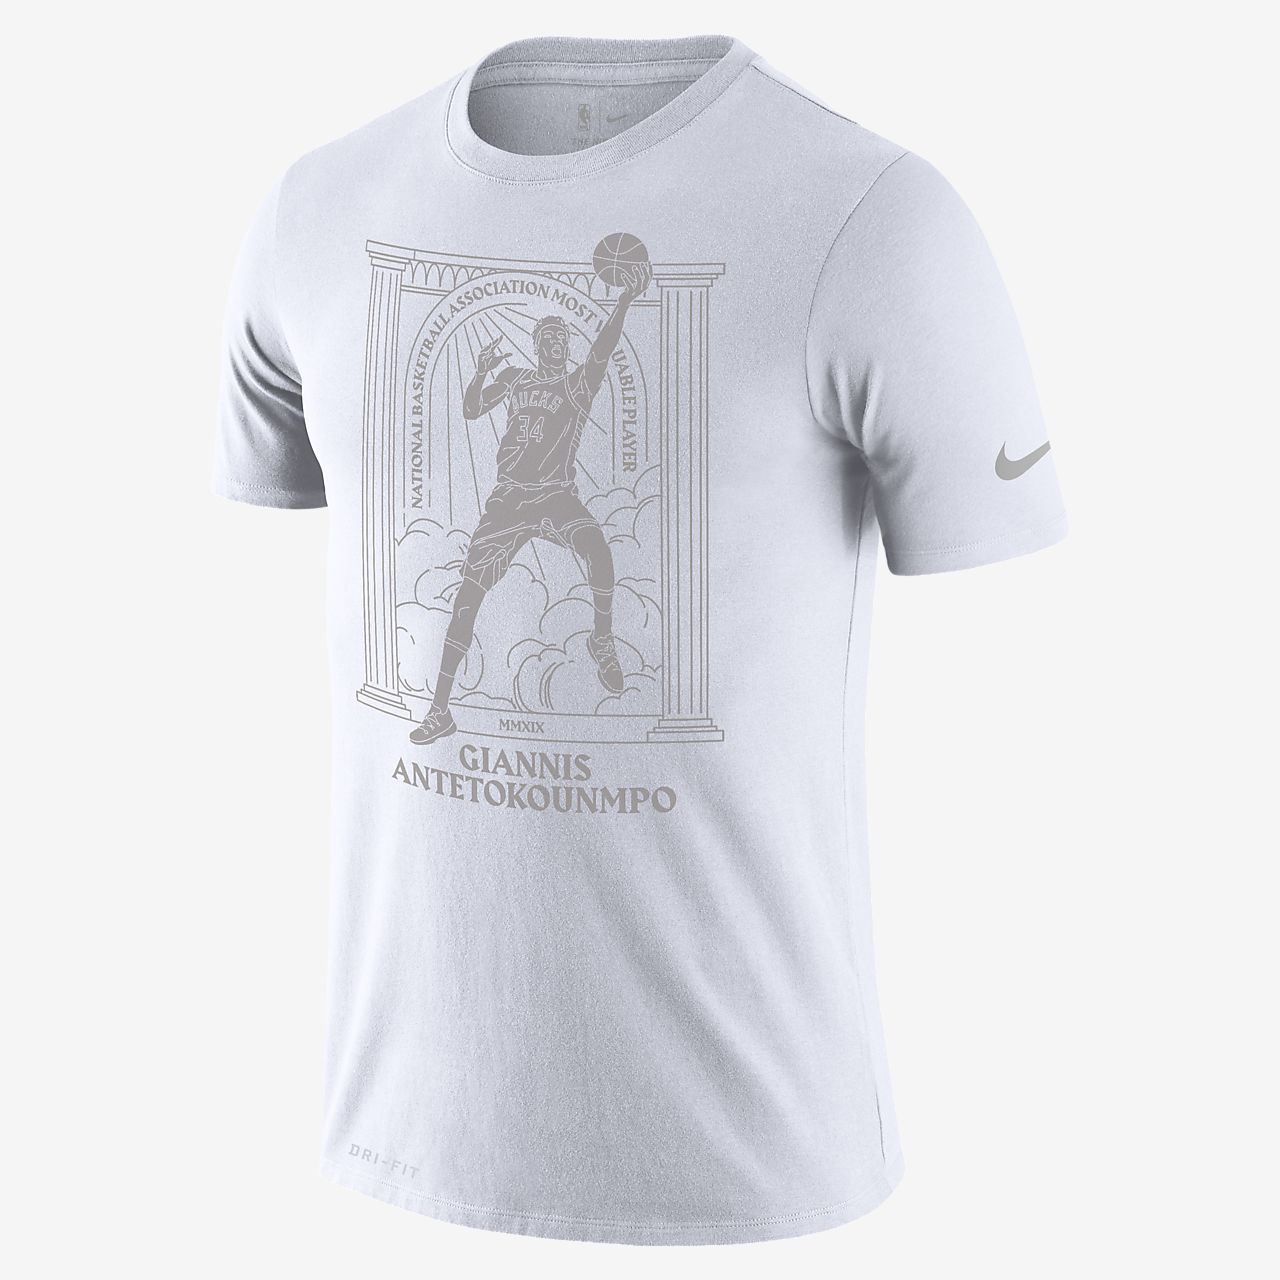 Giannis Antetokounmpo Bucks MVP Nike NBA-herenshirt met Dri-FIT